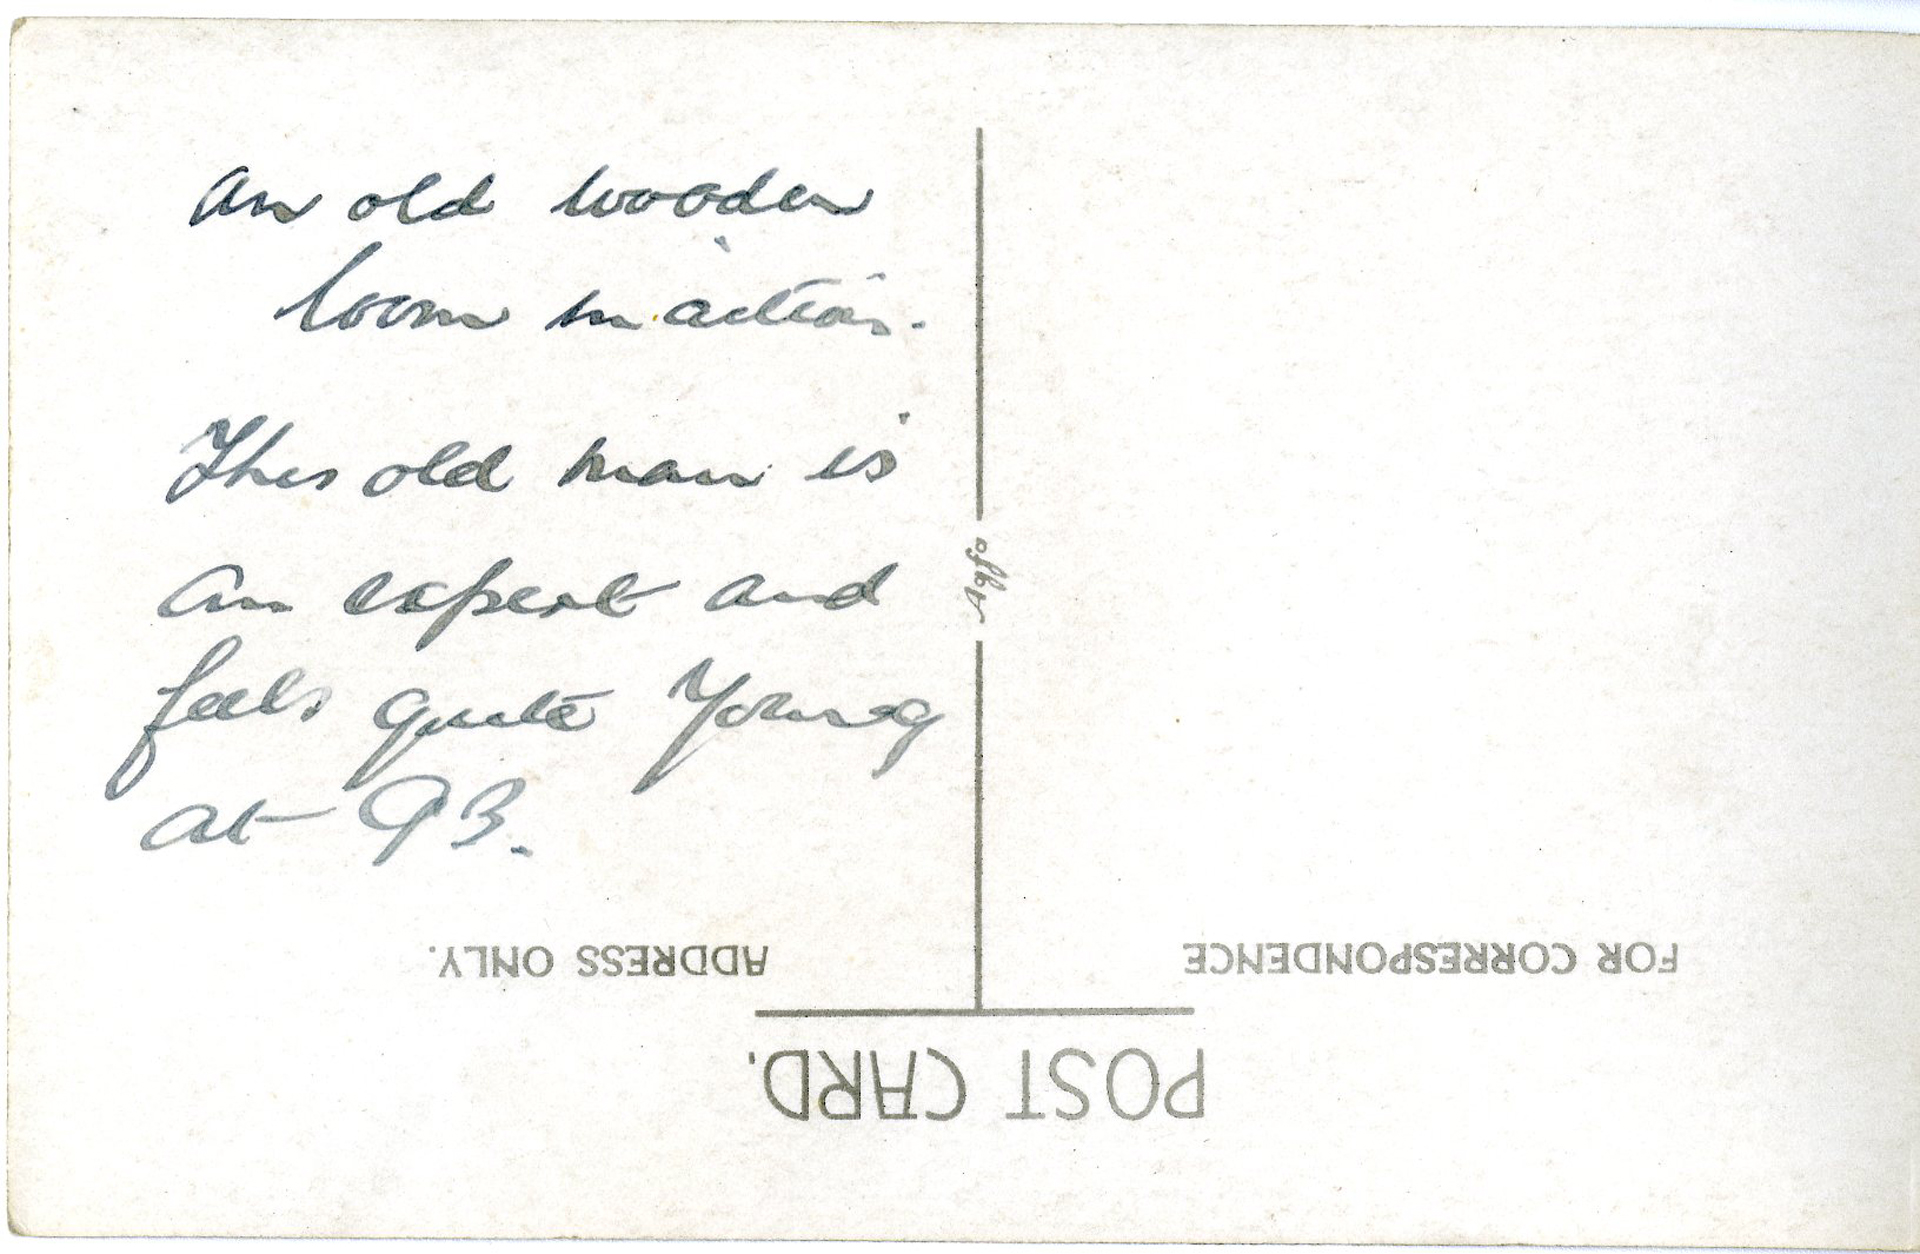 harris tweed authority archival postard